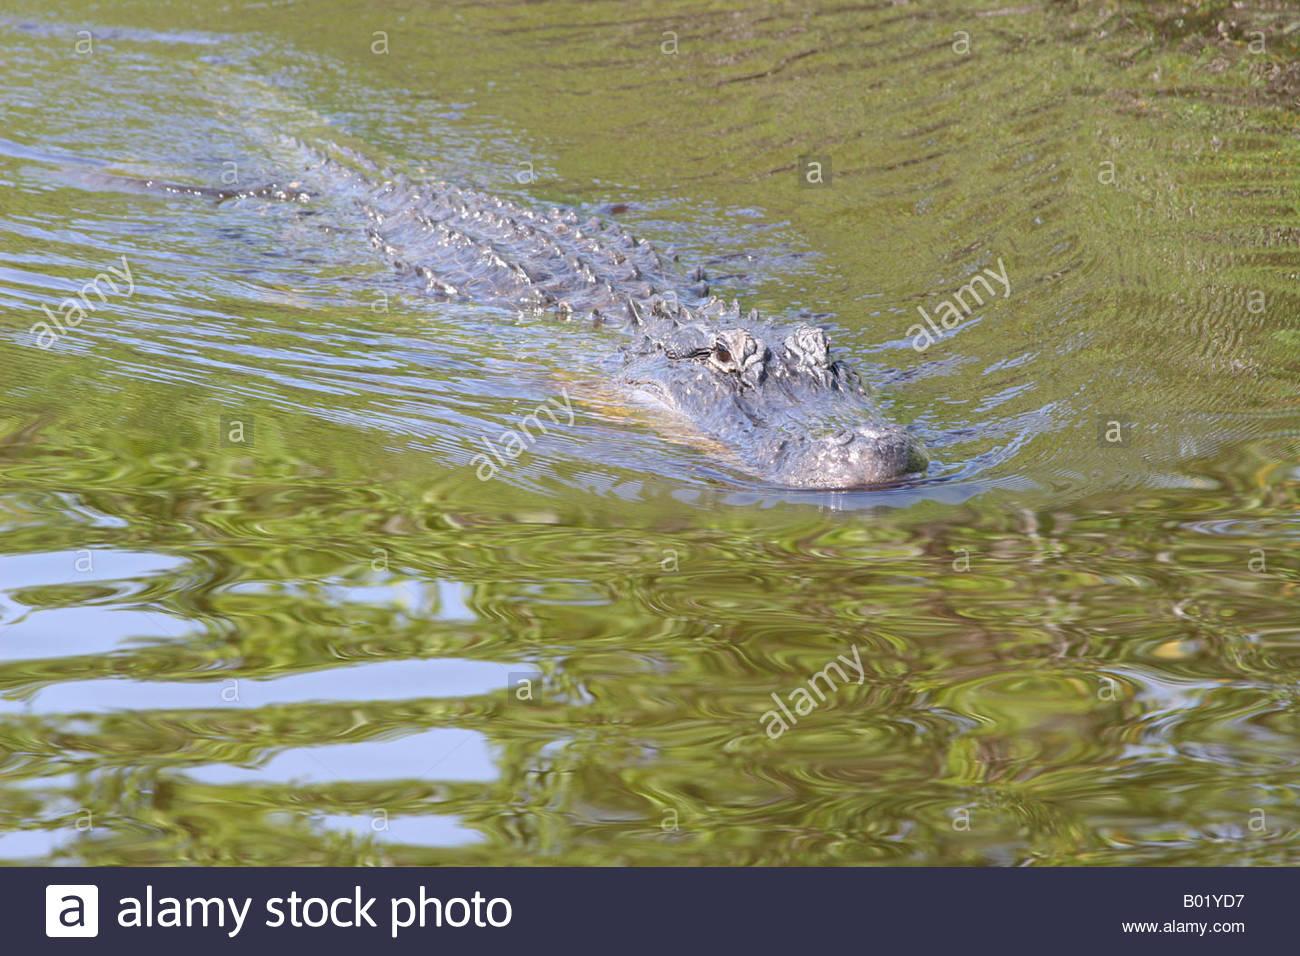 Gater Stock Photos & Gater Stock Images - Alamy pour Mots Gator